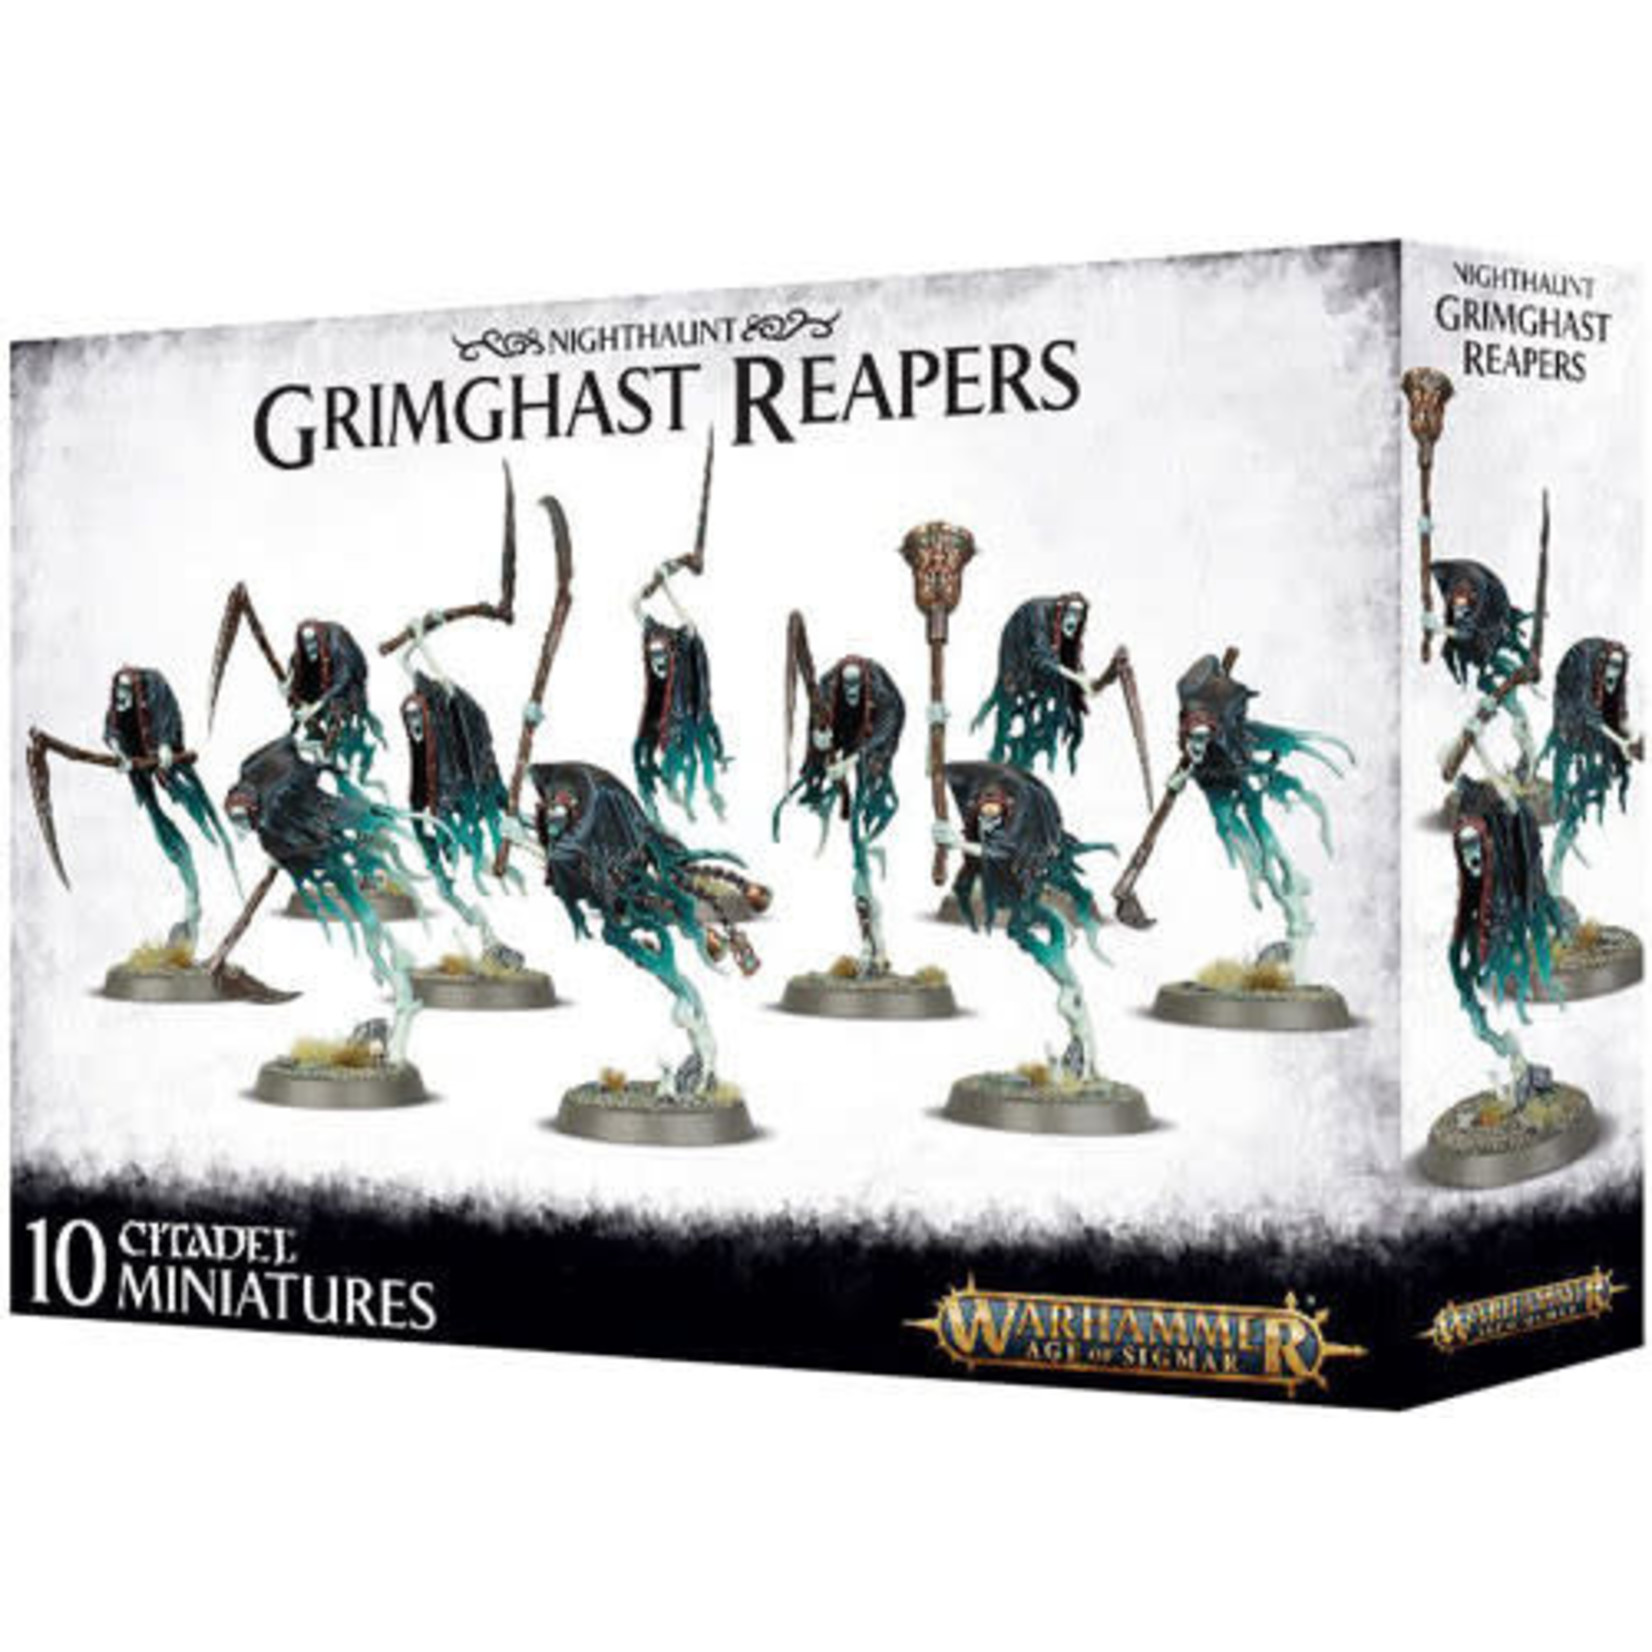 Games Workshop Warhammer AoS: Nighthaunt Grimghast Reapers